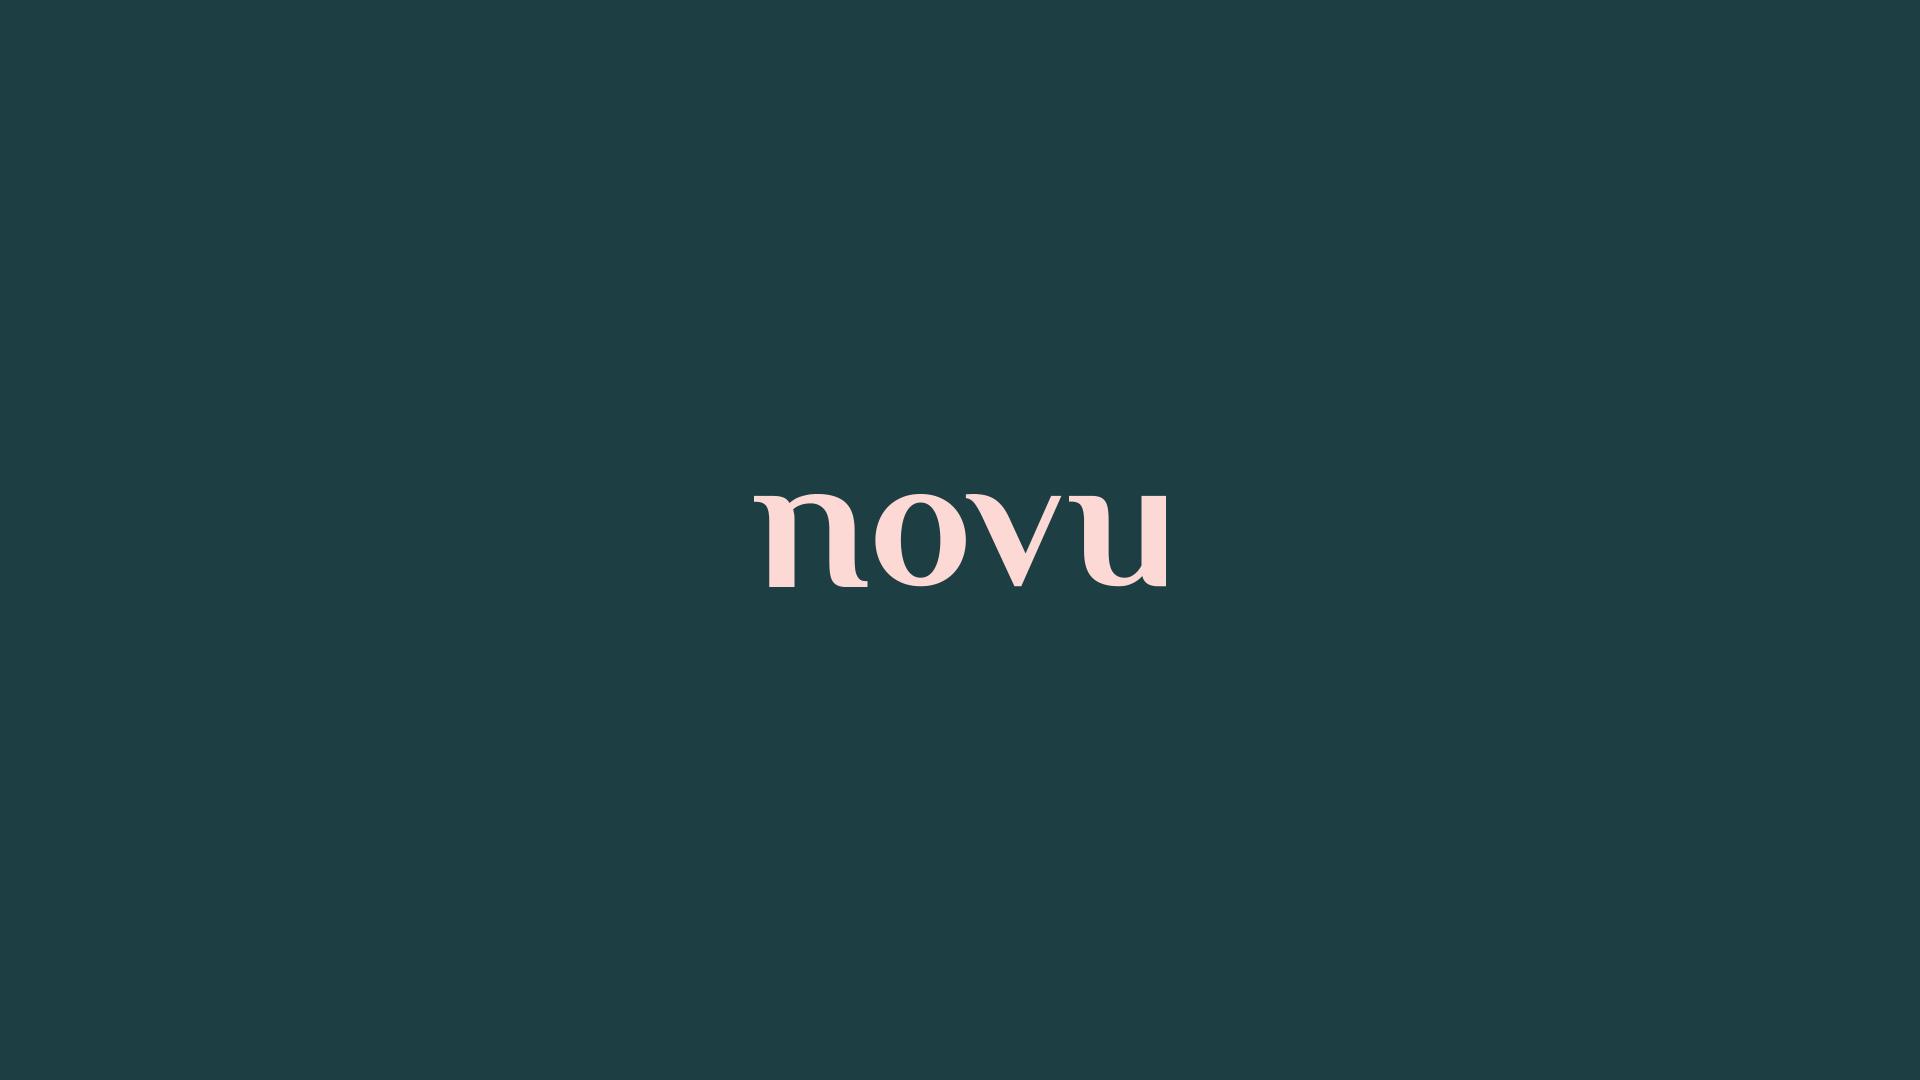 Novu_Branding_3.png